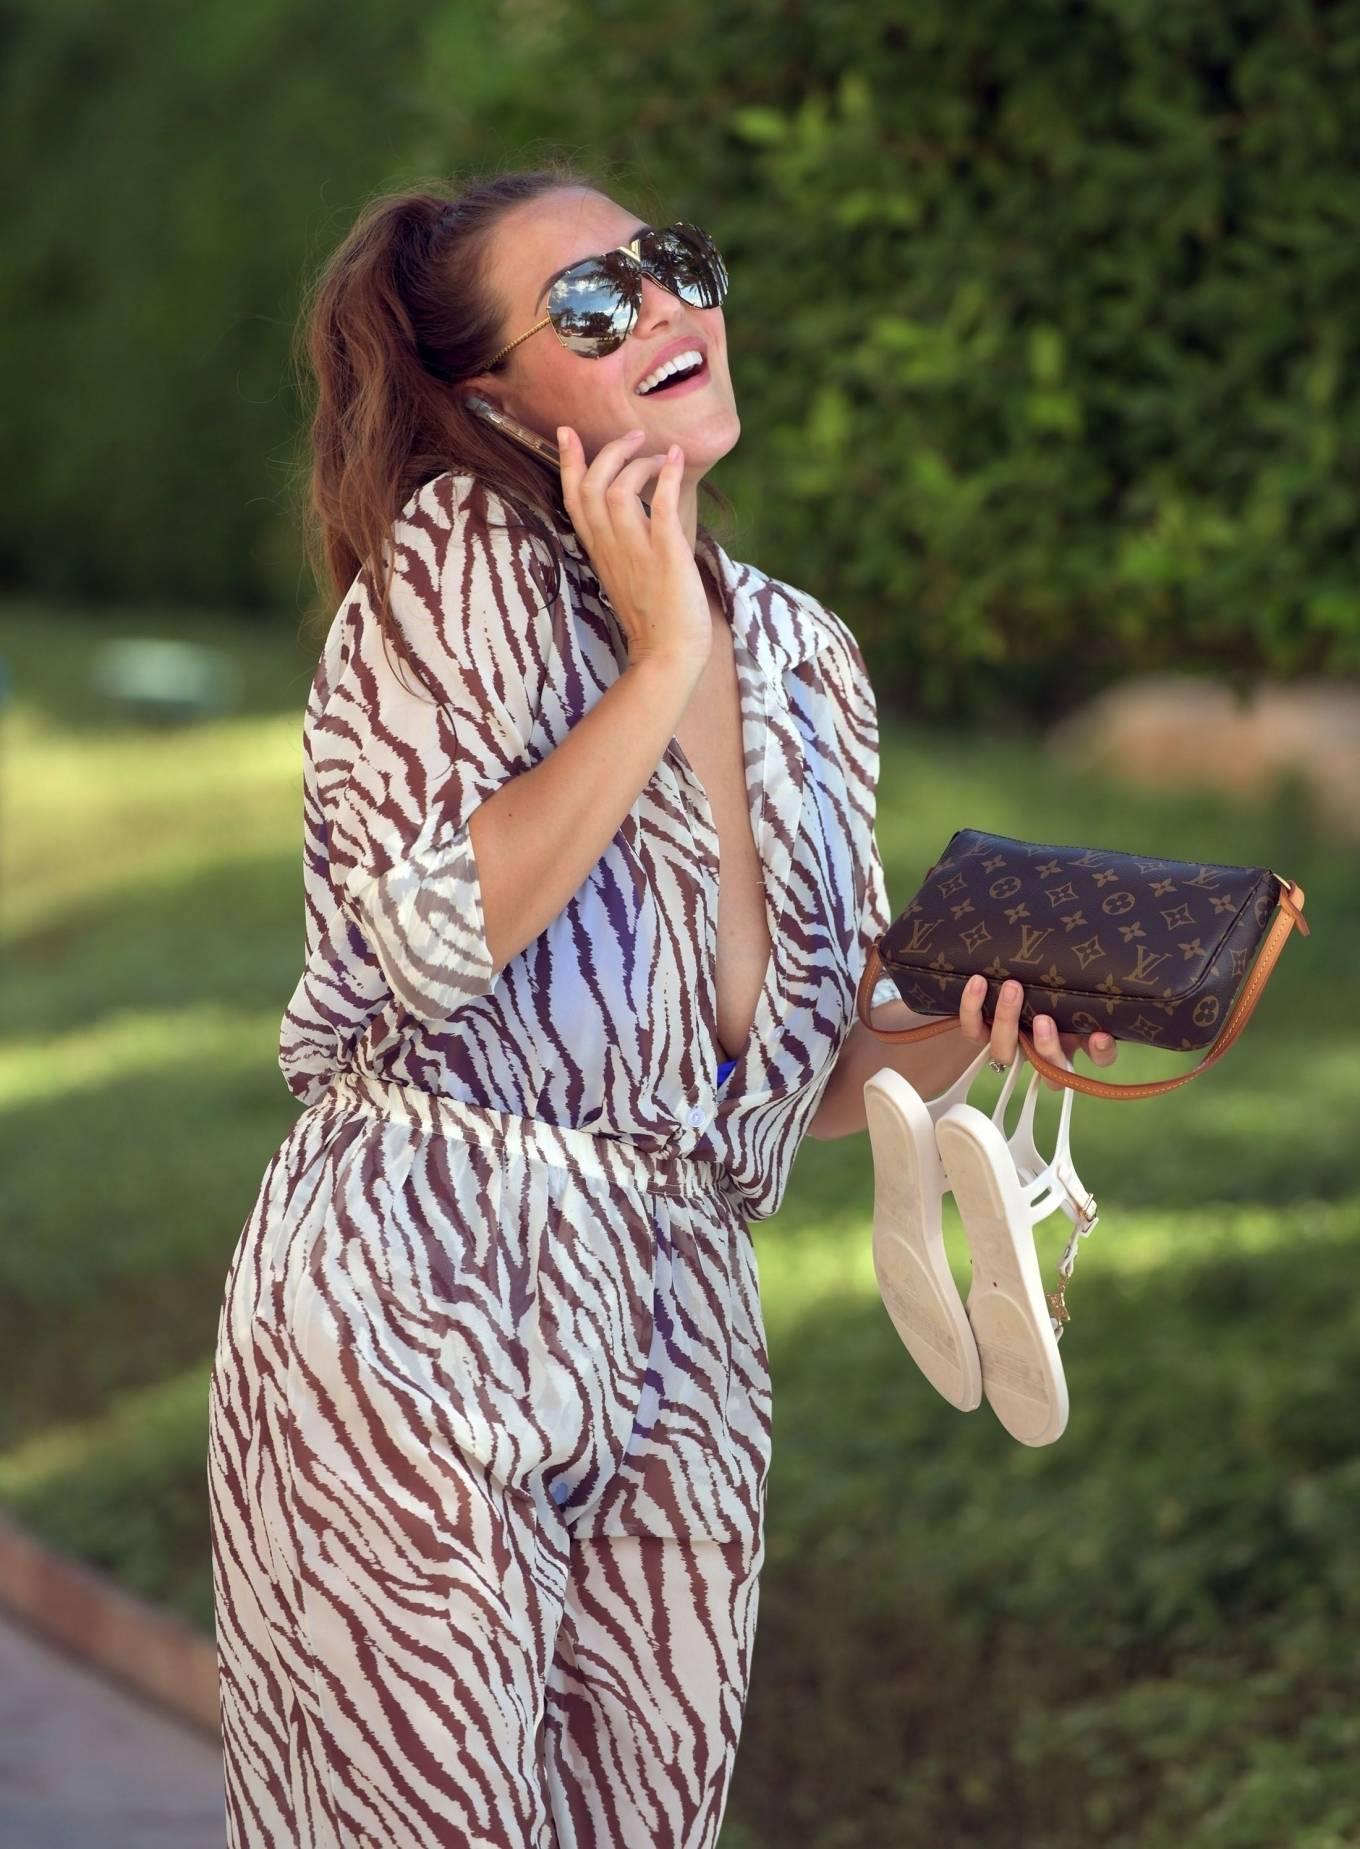 Chloe Goodman 2020 : Chloe Goodman – In a zebra print jumpsuit out on holiday in Dubai-20